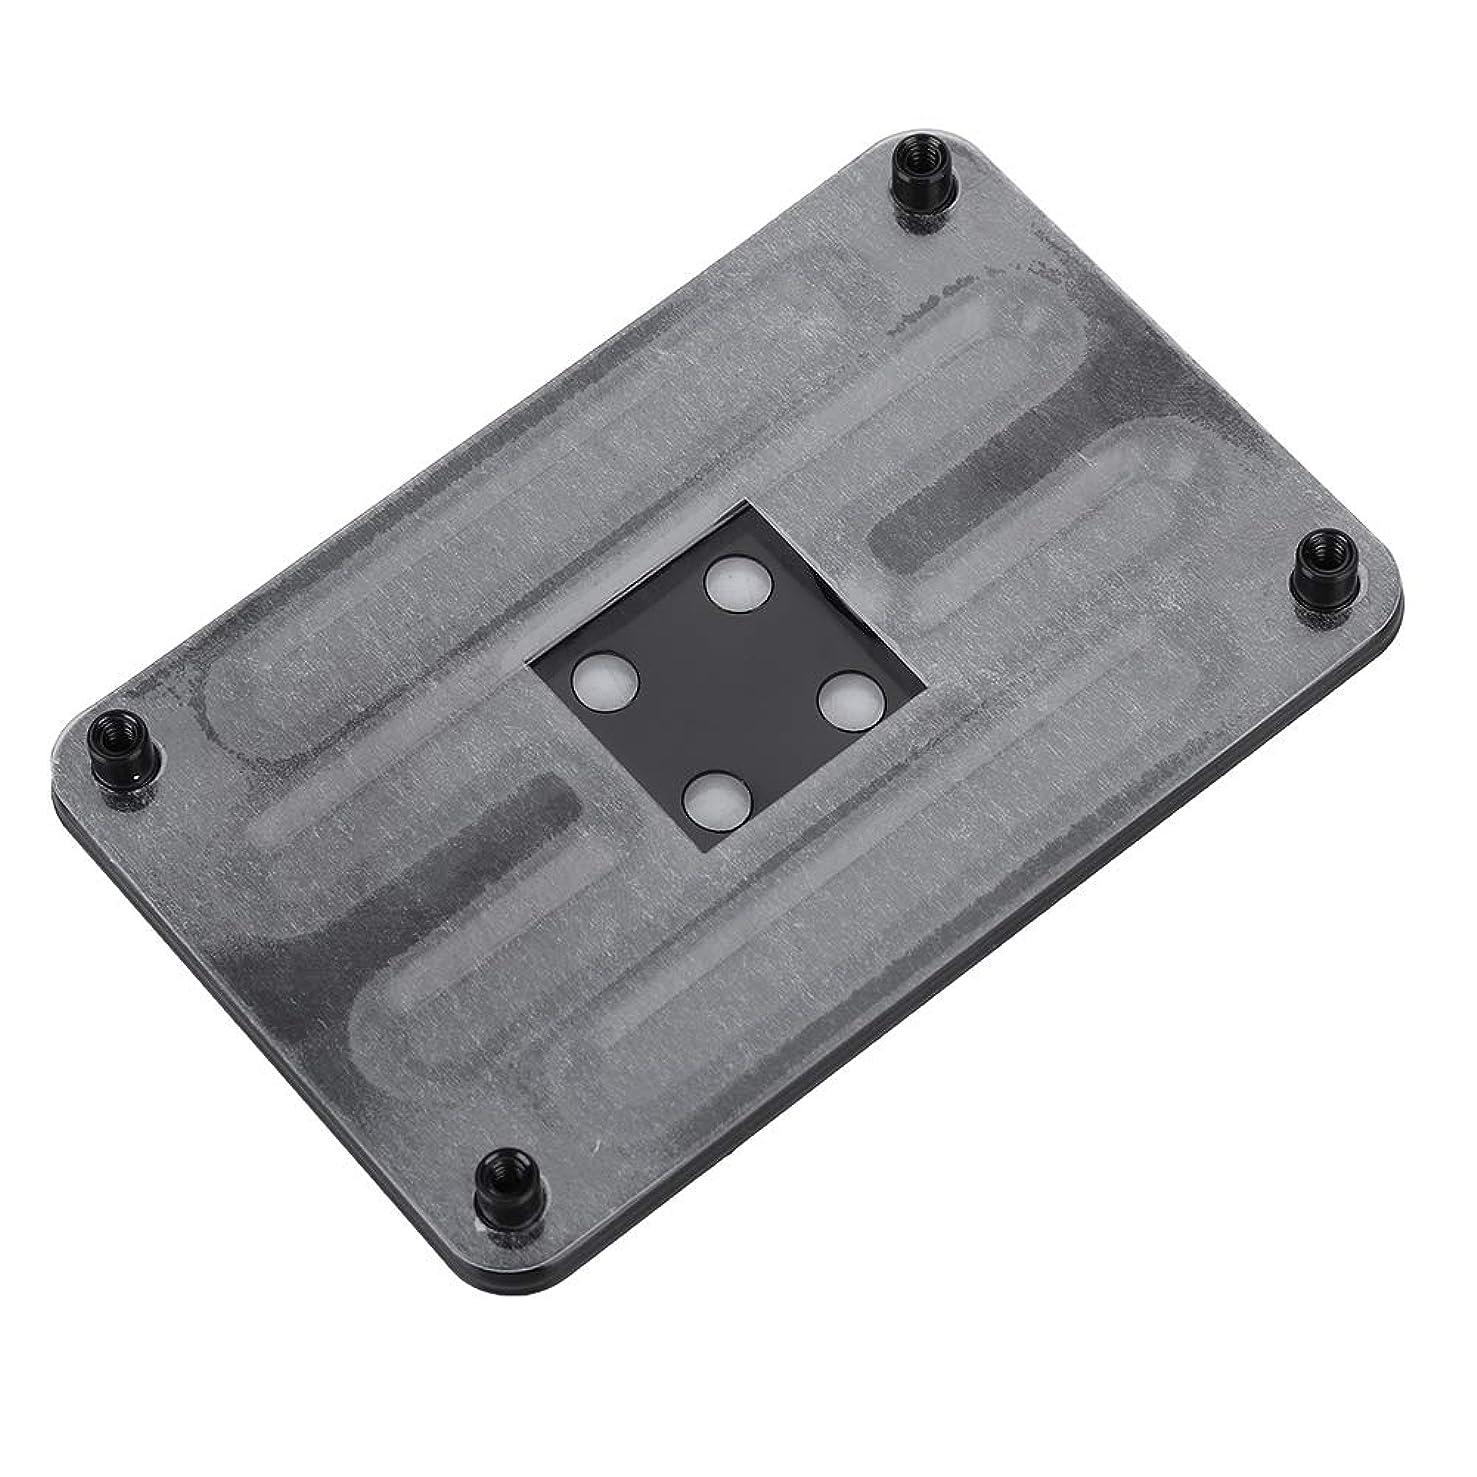 Wendry CPU Heatsink Bracket, Made of Iron, Black Backplane Bracket for AM4